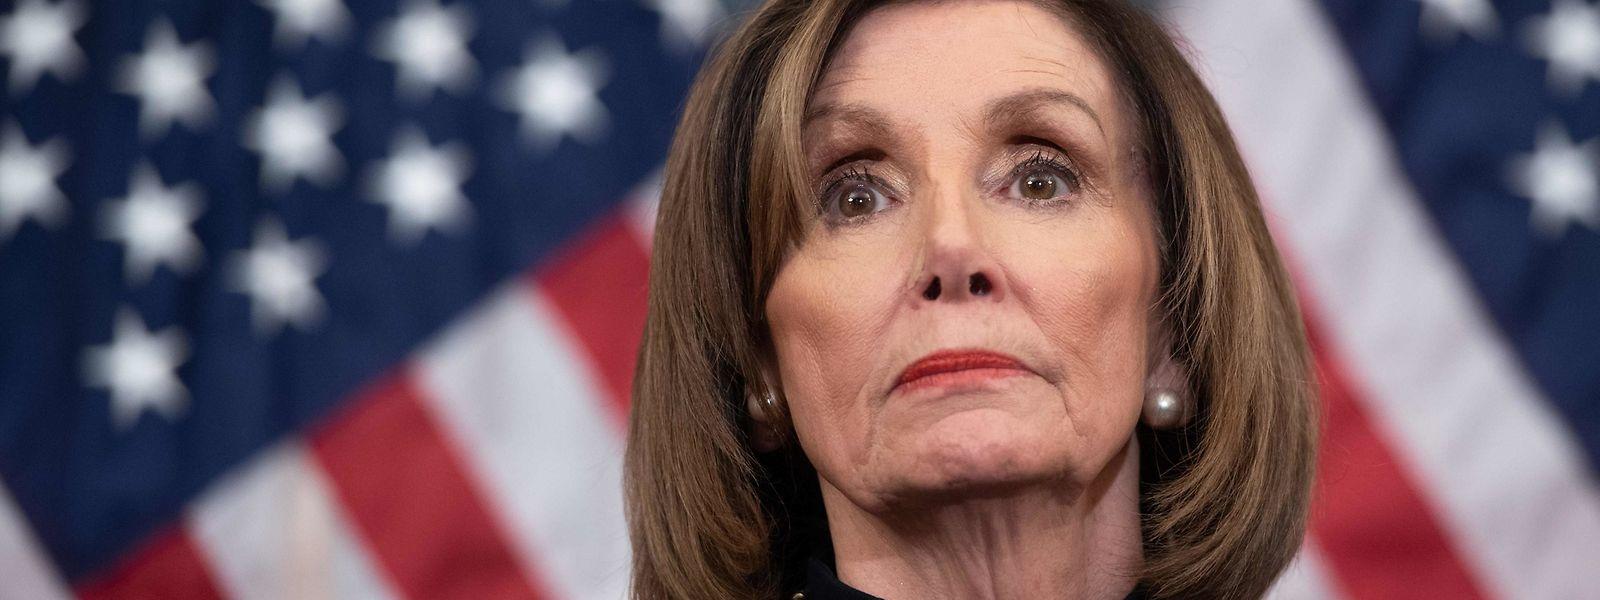 Die Sprecherin des US-Repräsentantenhauses, Nancy Pelosi.